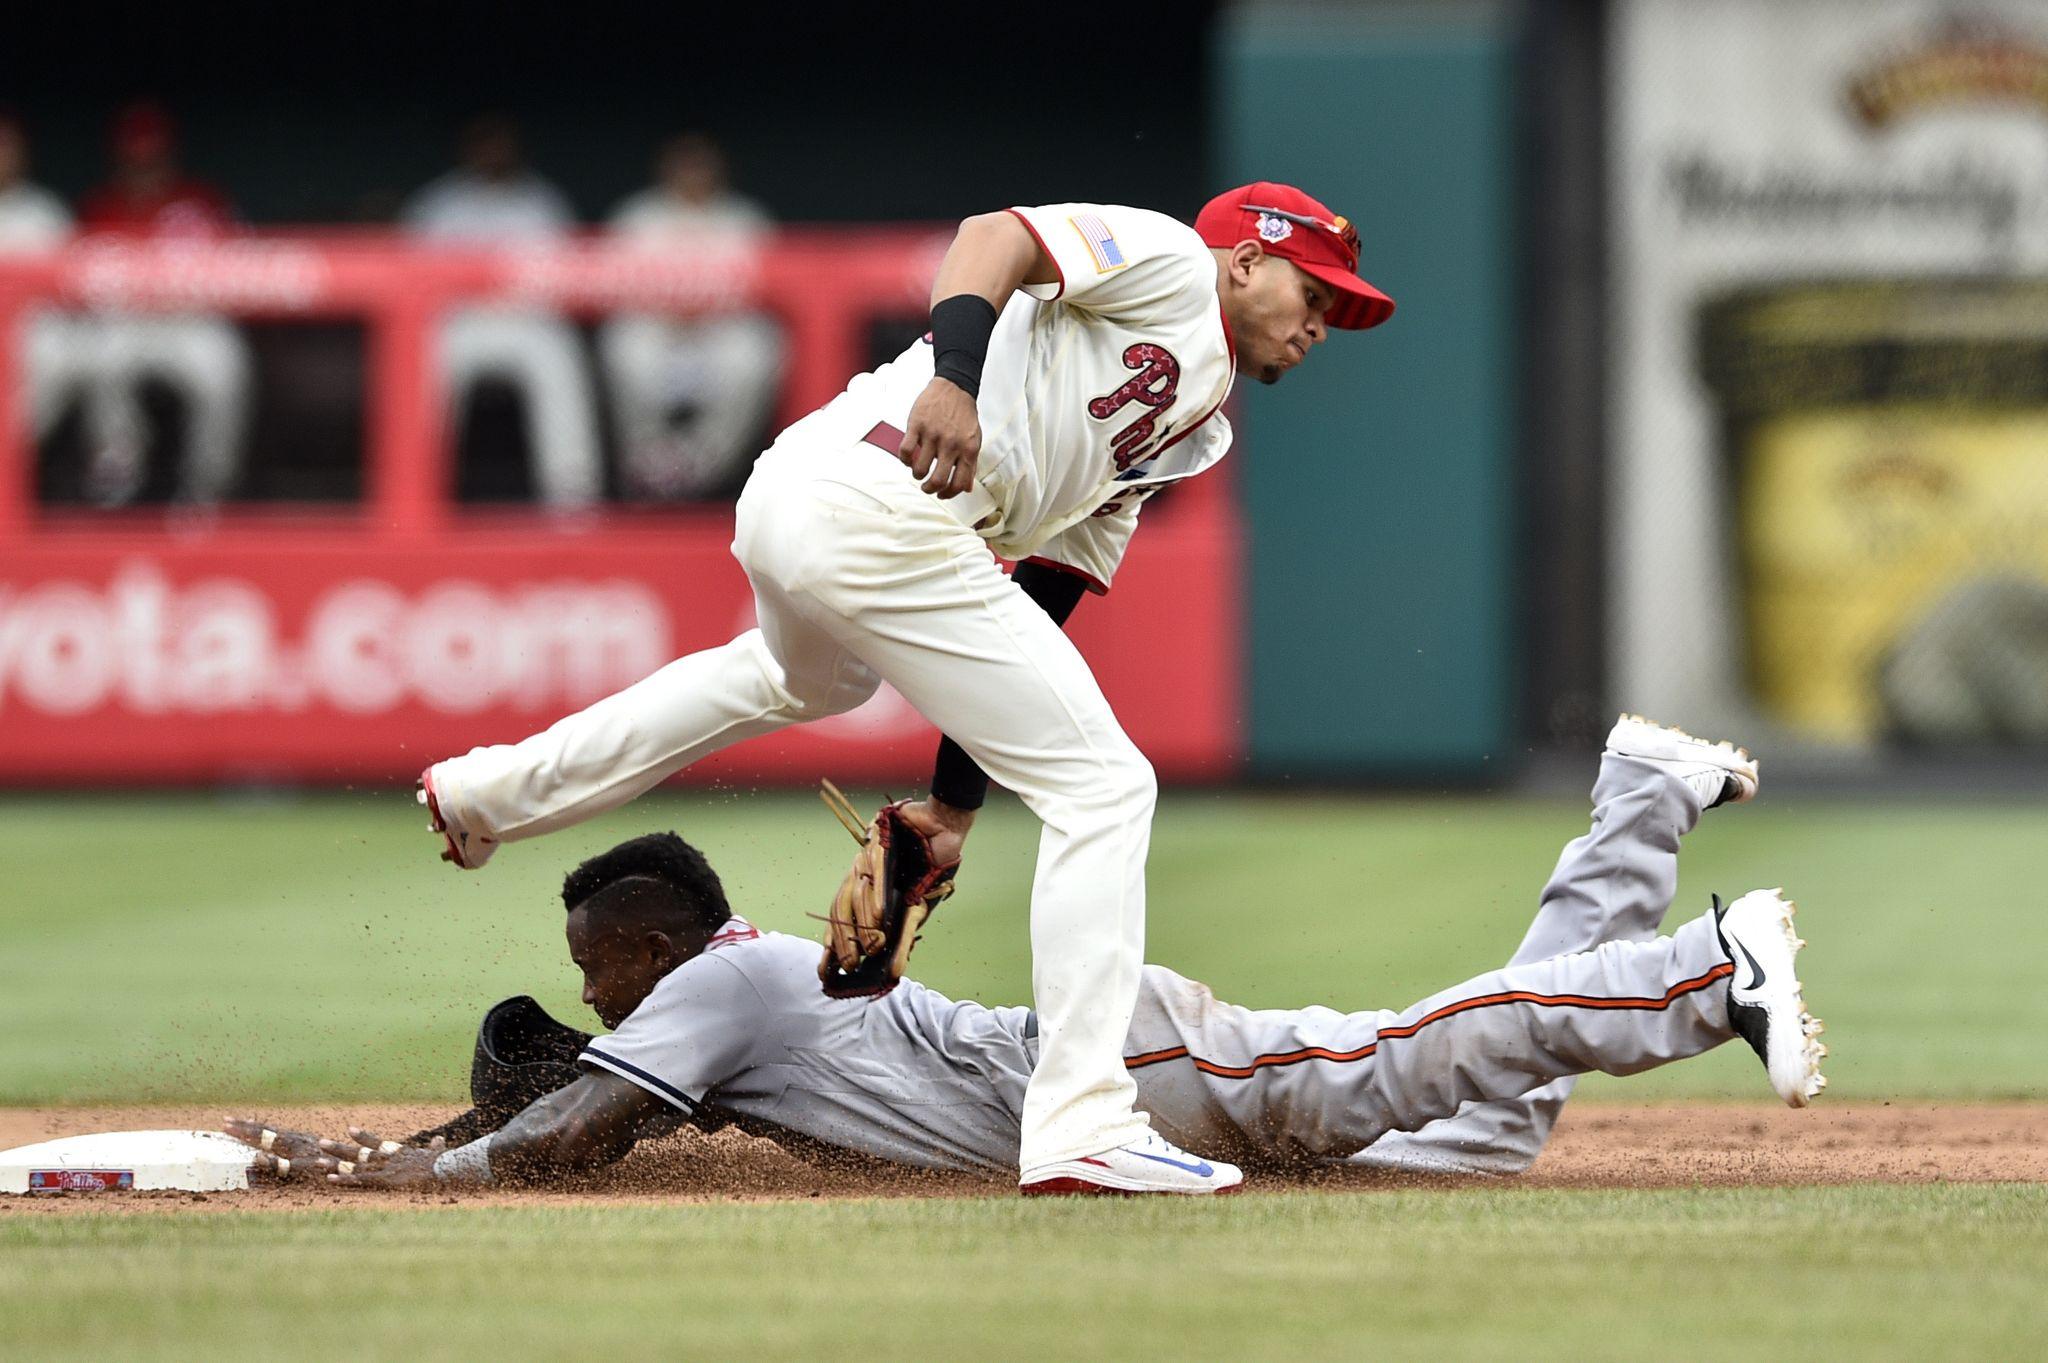 Orioles_phillies_baseball_94244.jpg-fdf03_s2048x1363